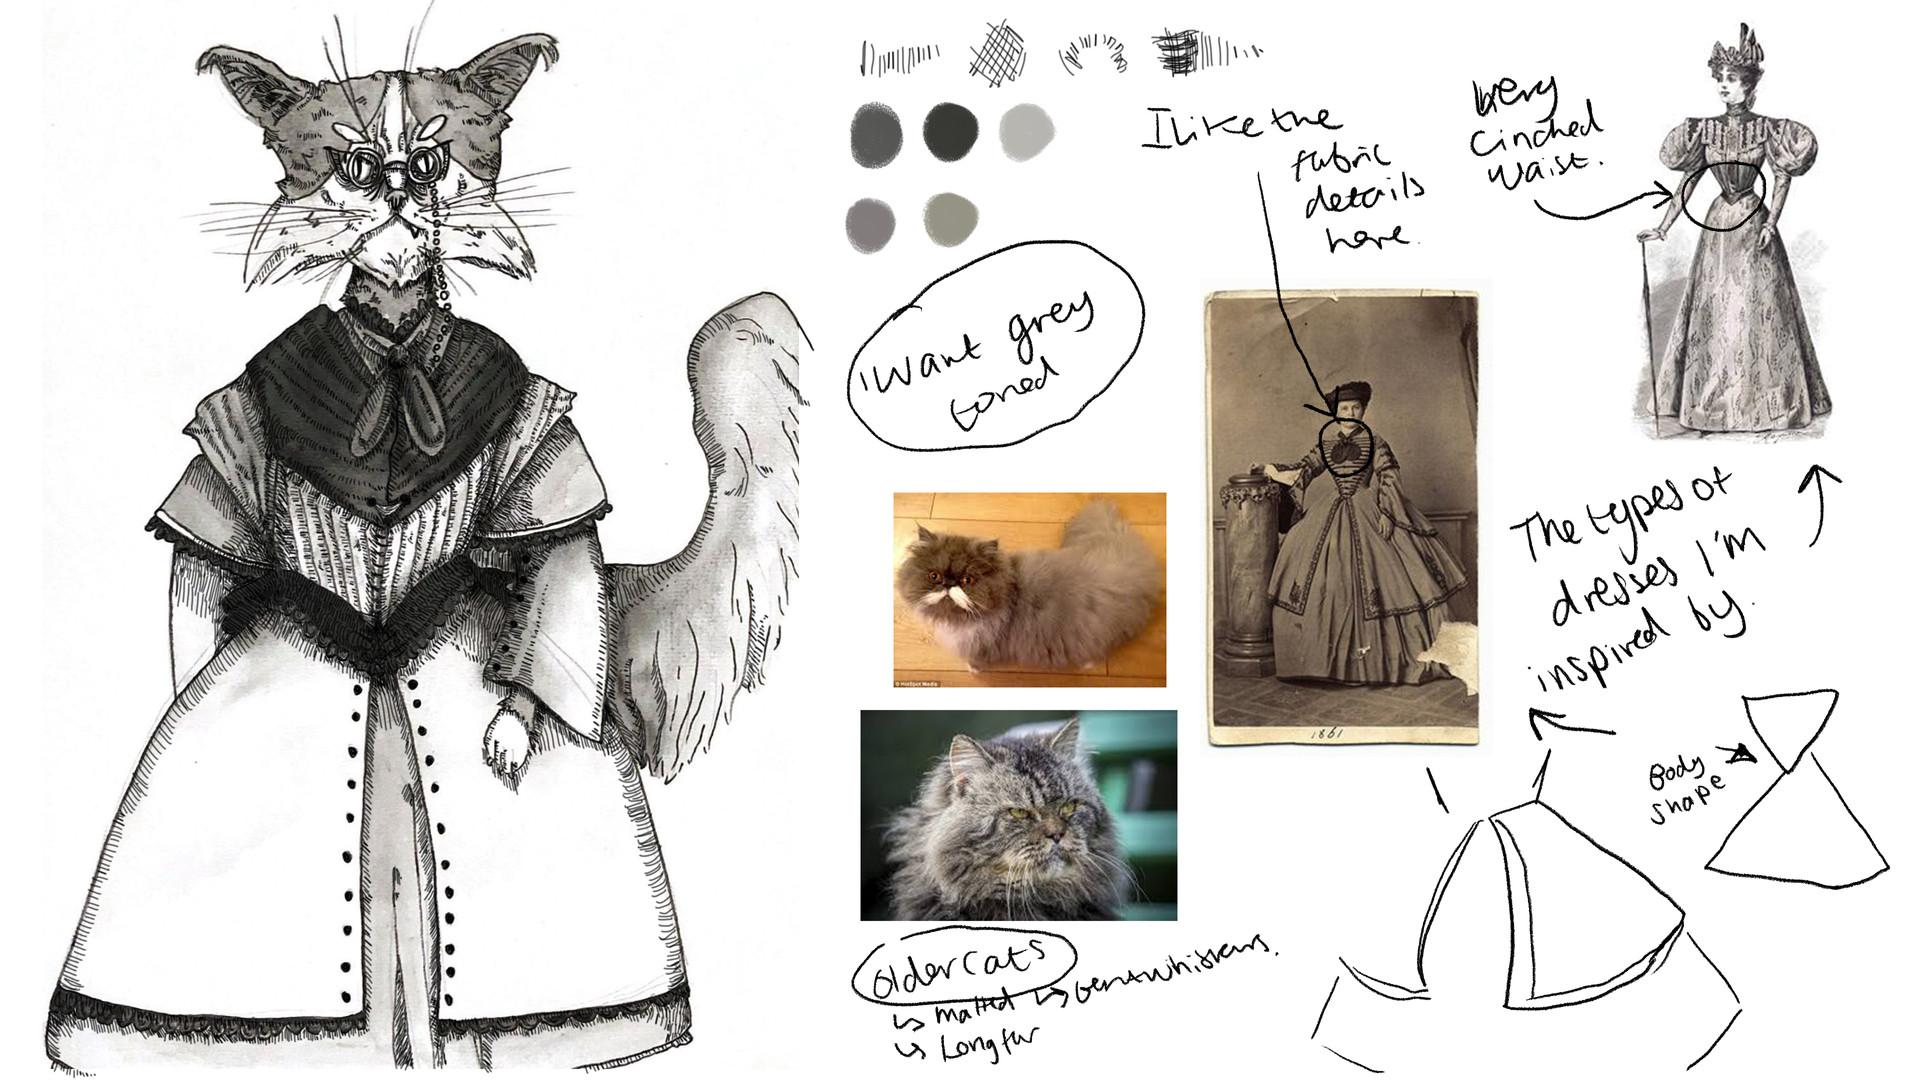 Costume and shape ideas